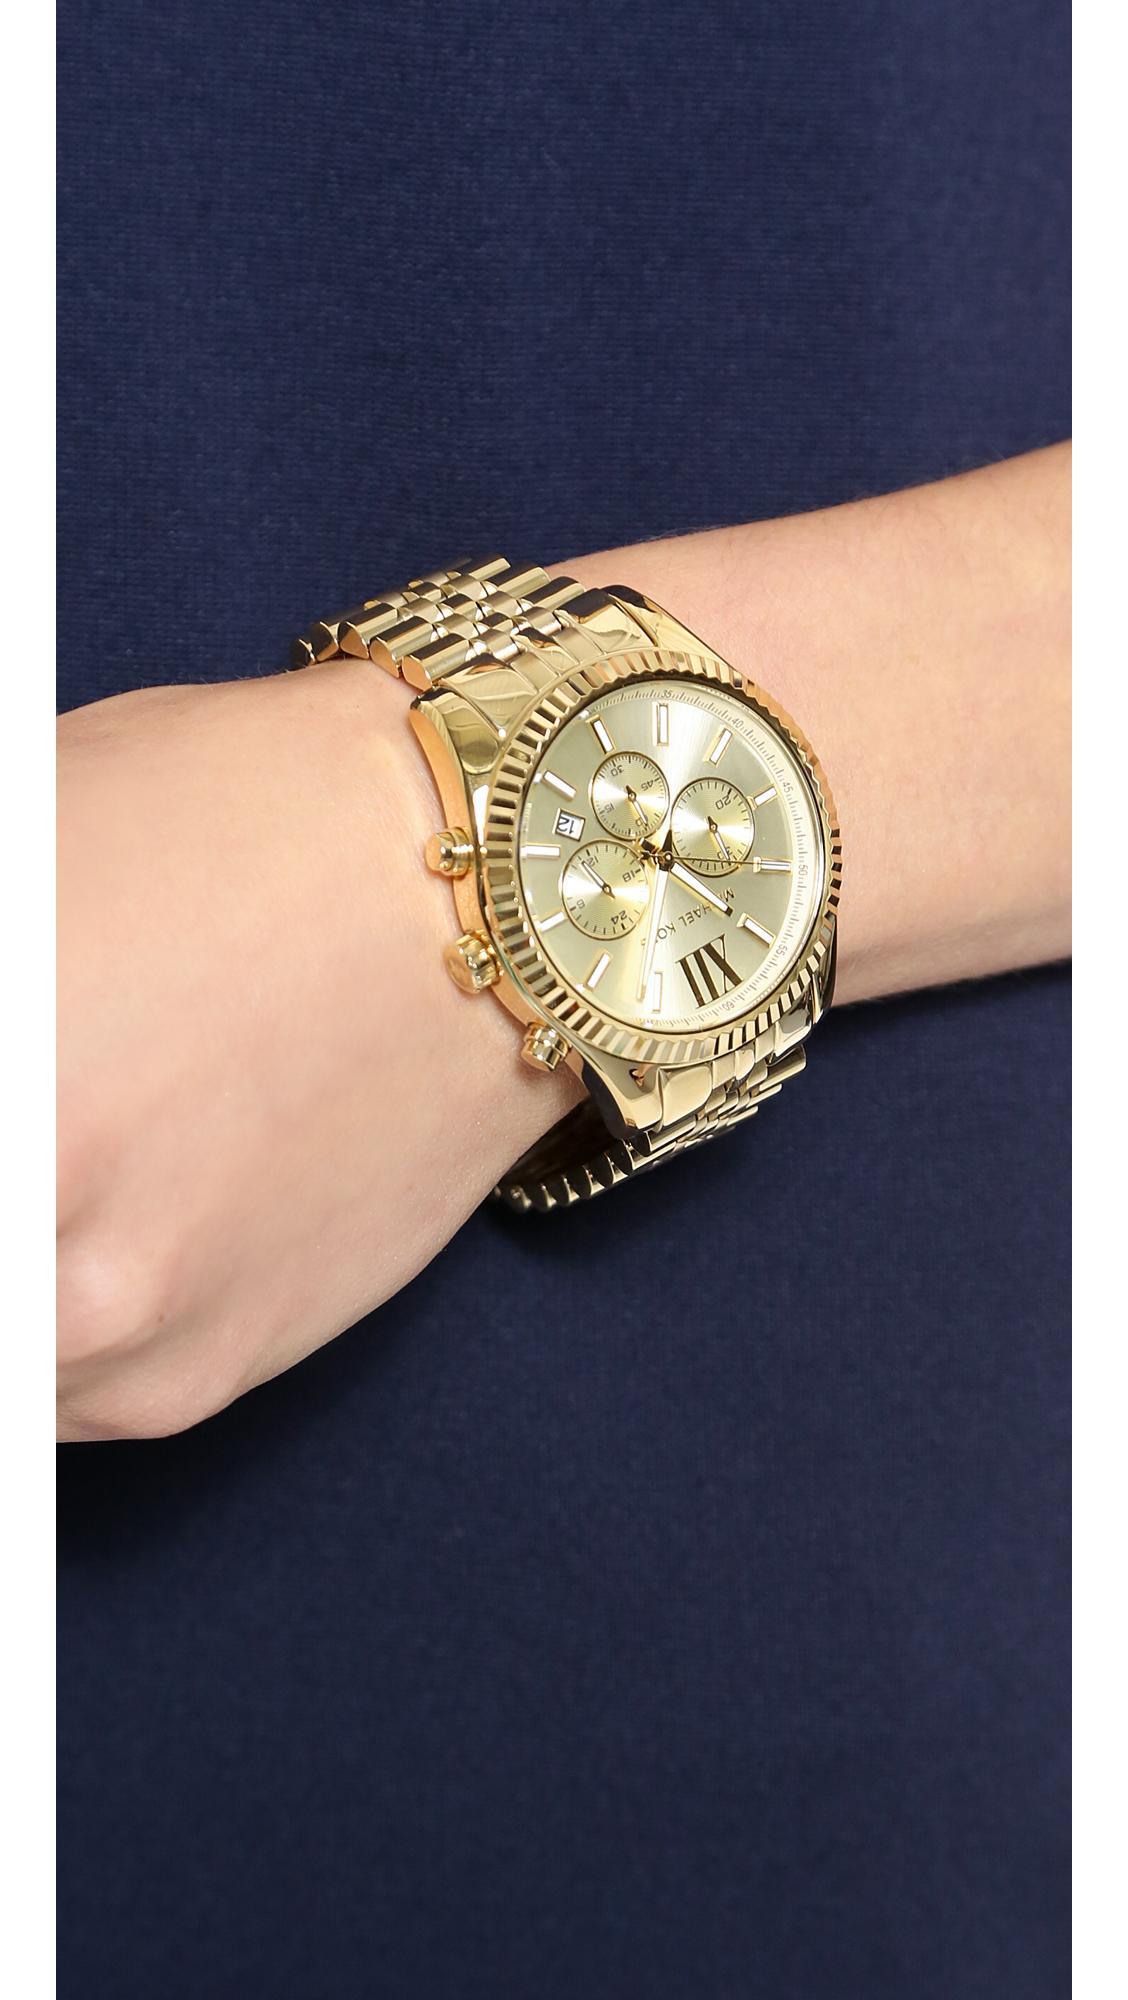 f8ad61117 Michael Kors Men's Oversized Lexington Watch - Gold in Metallic - Lyst